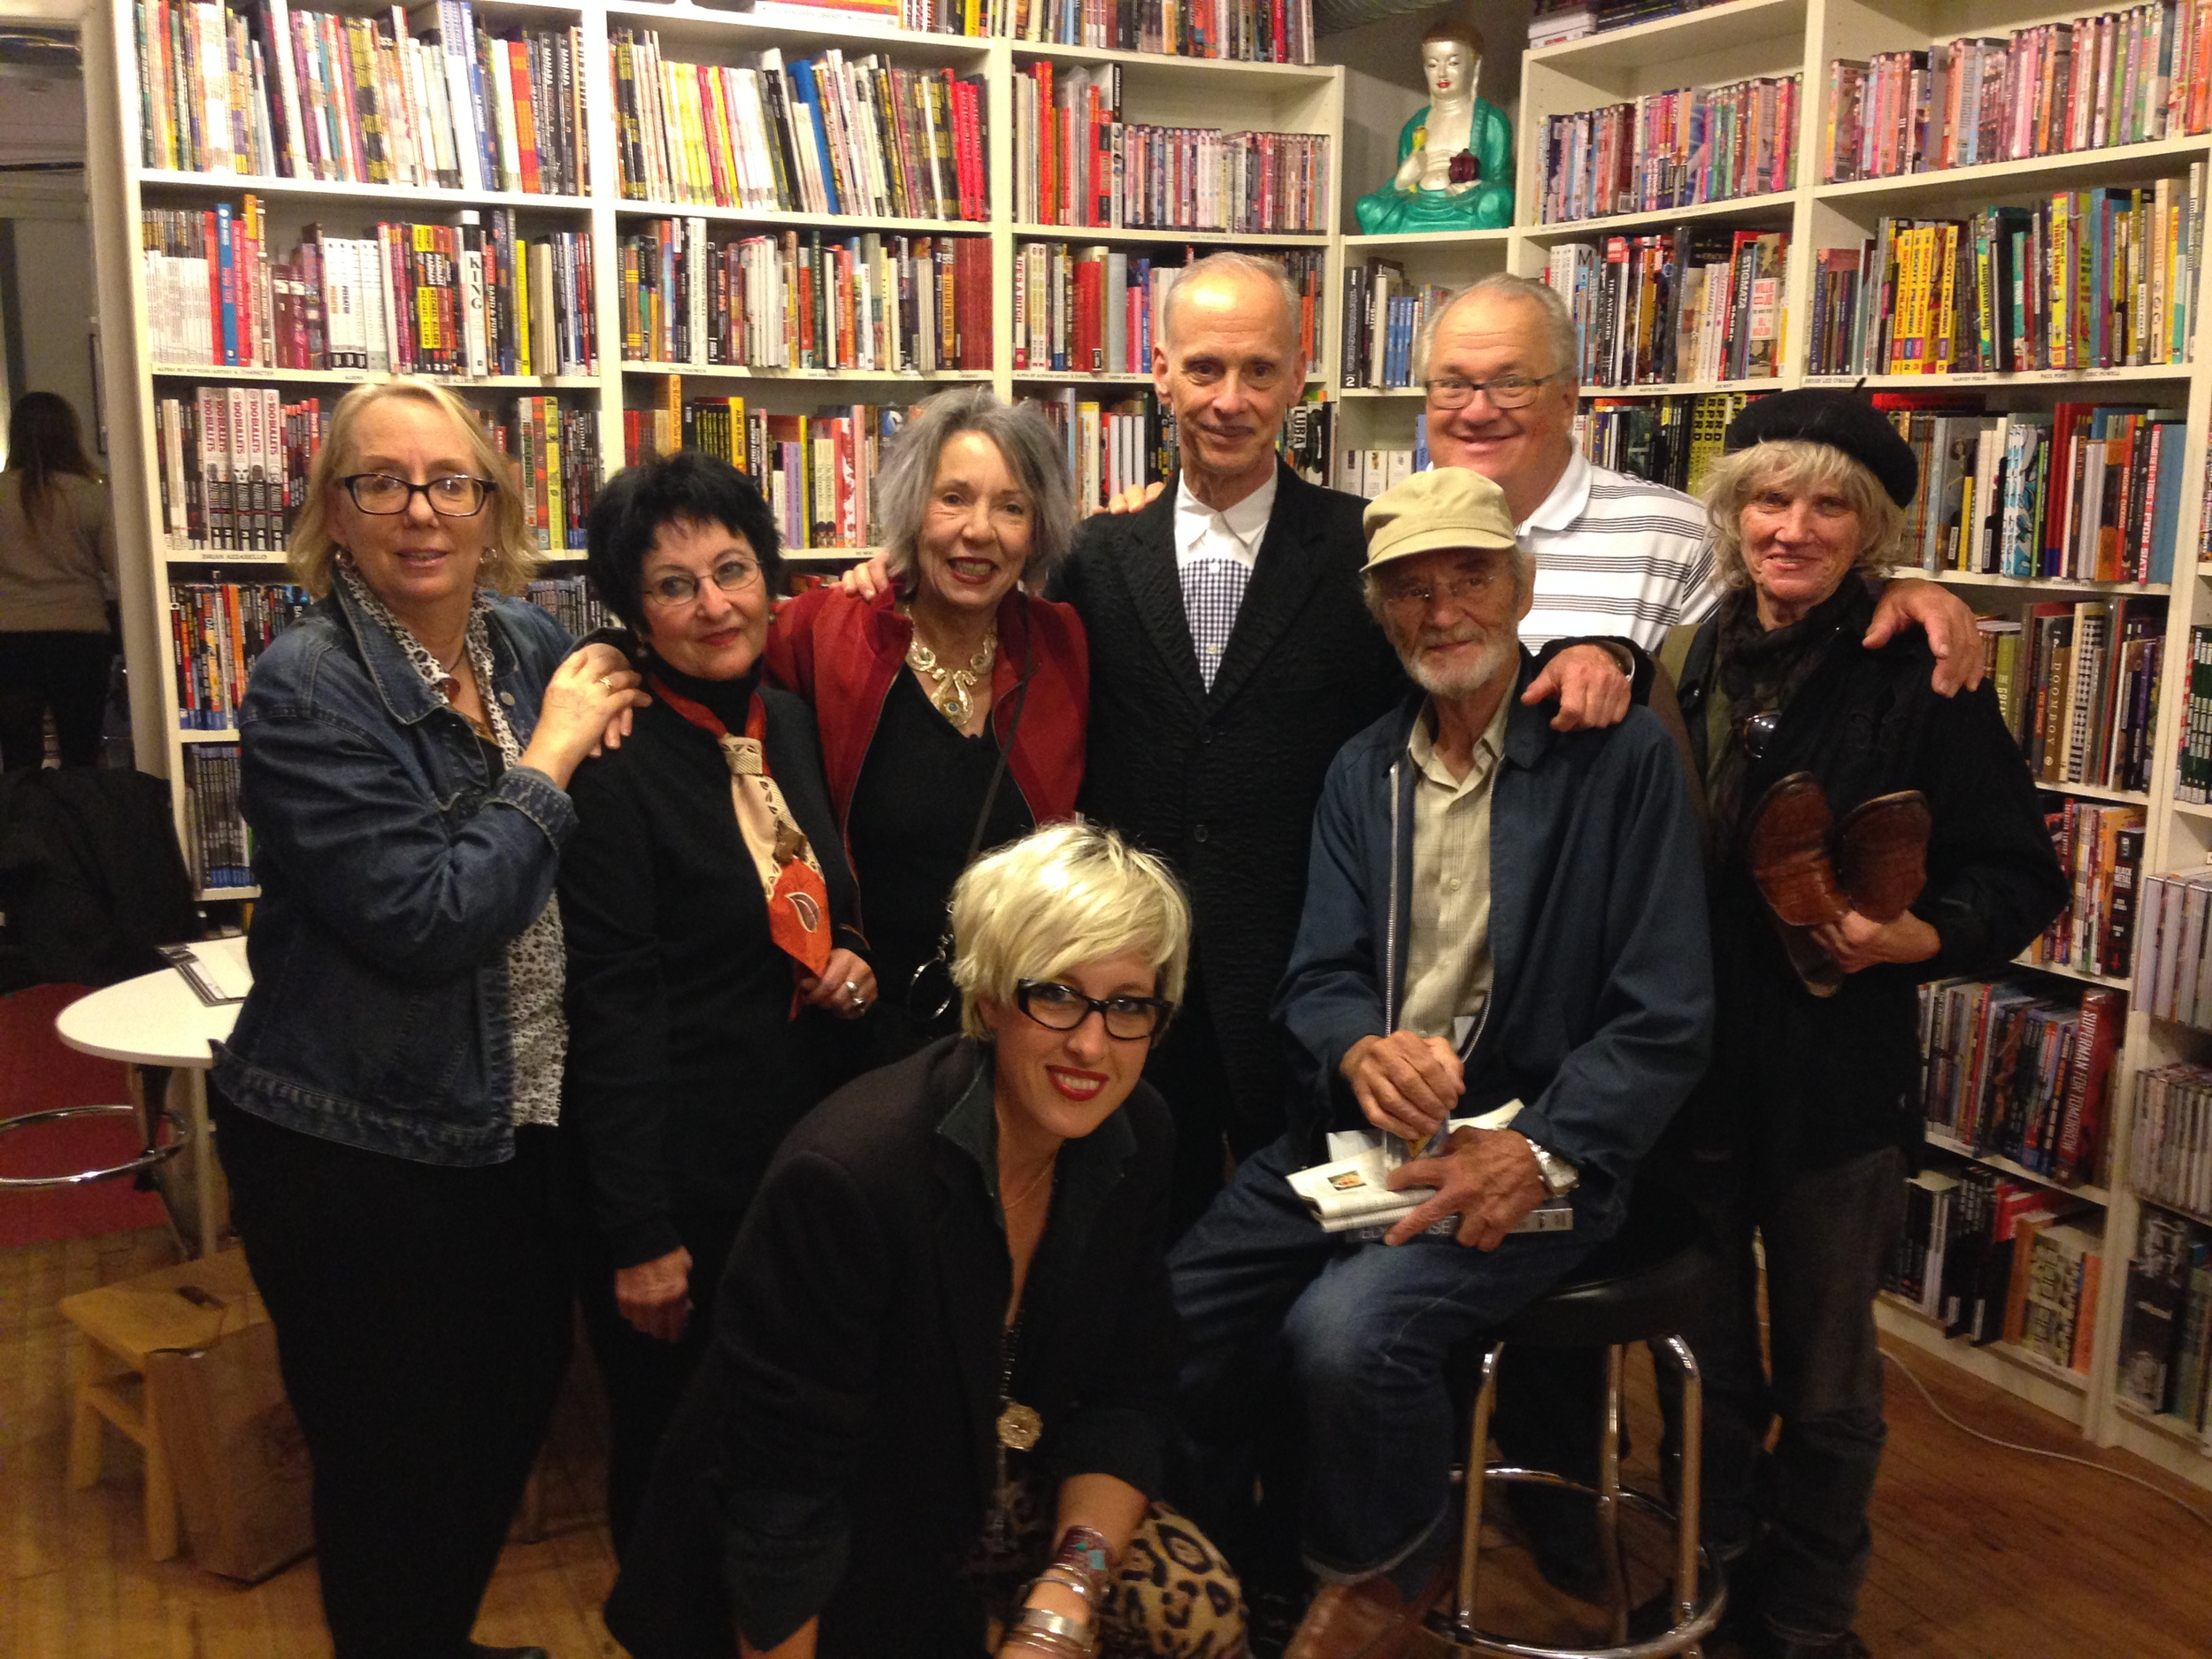 Mink Stole, Pat Burgee, Sue Lowe, John Waters, John Oden, Bob Adams, Sharon Niesp and Chloe Griffin at Atomic Books, BALTIMORE